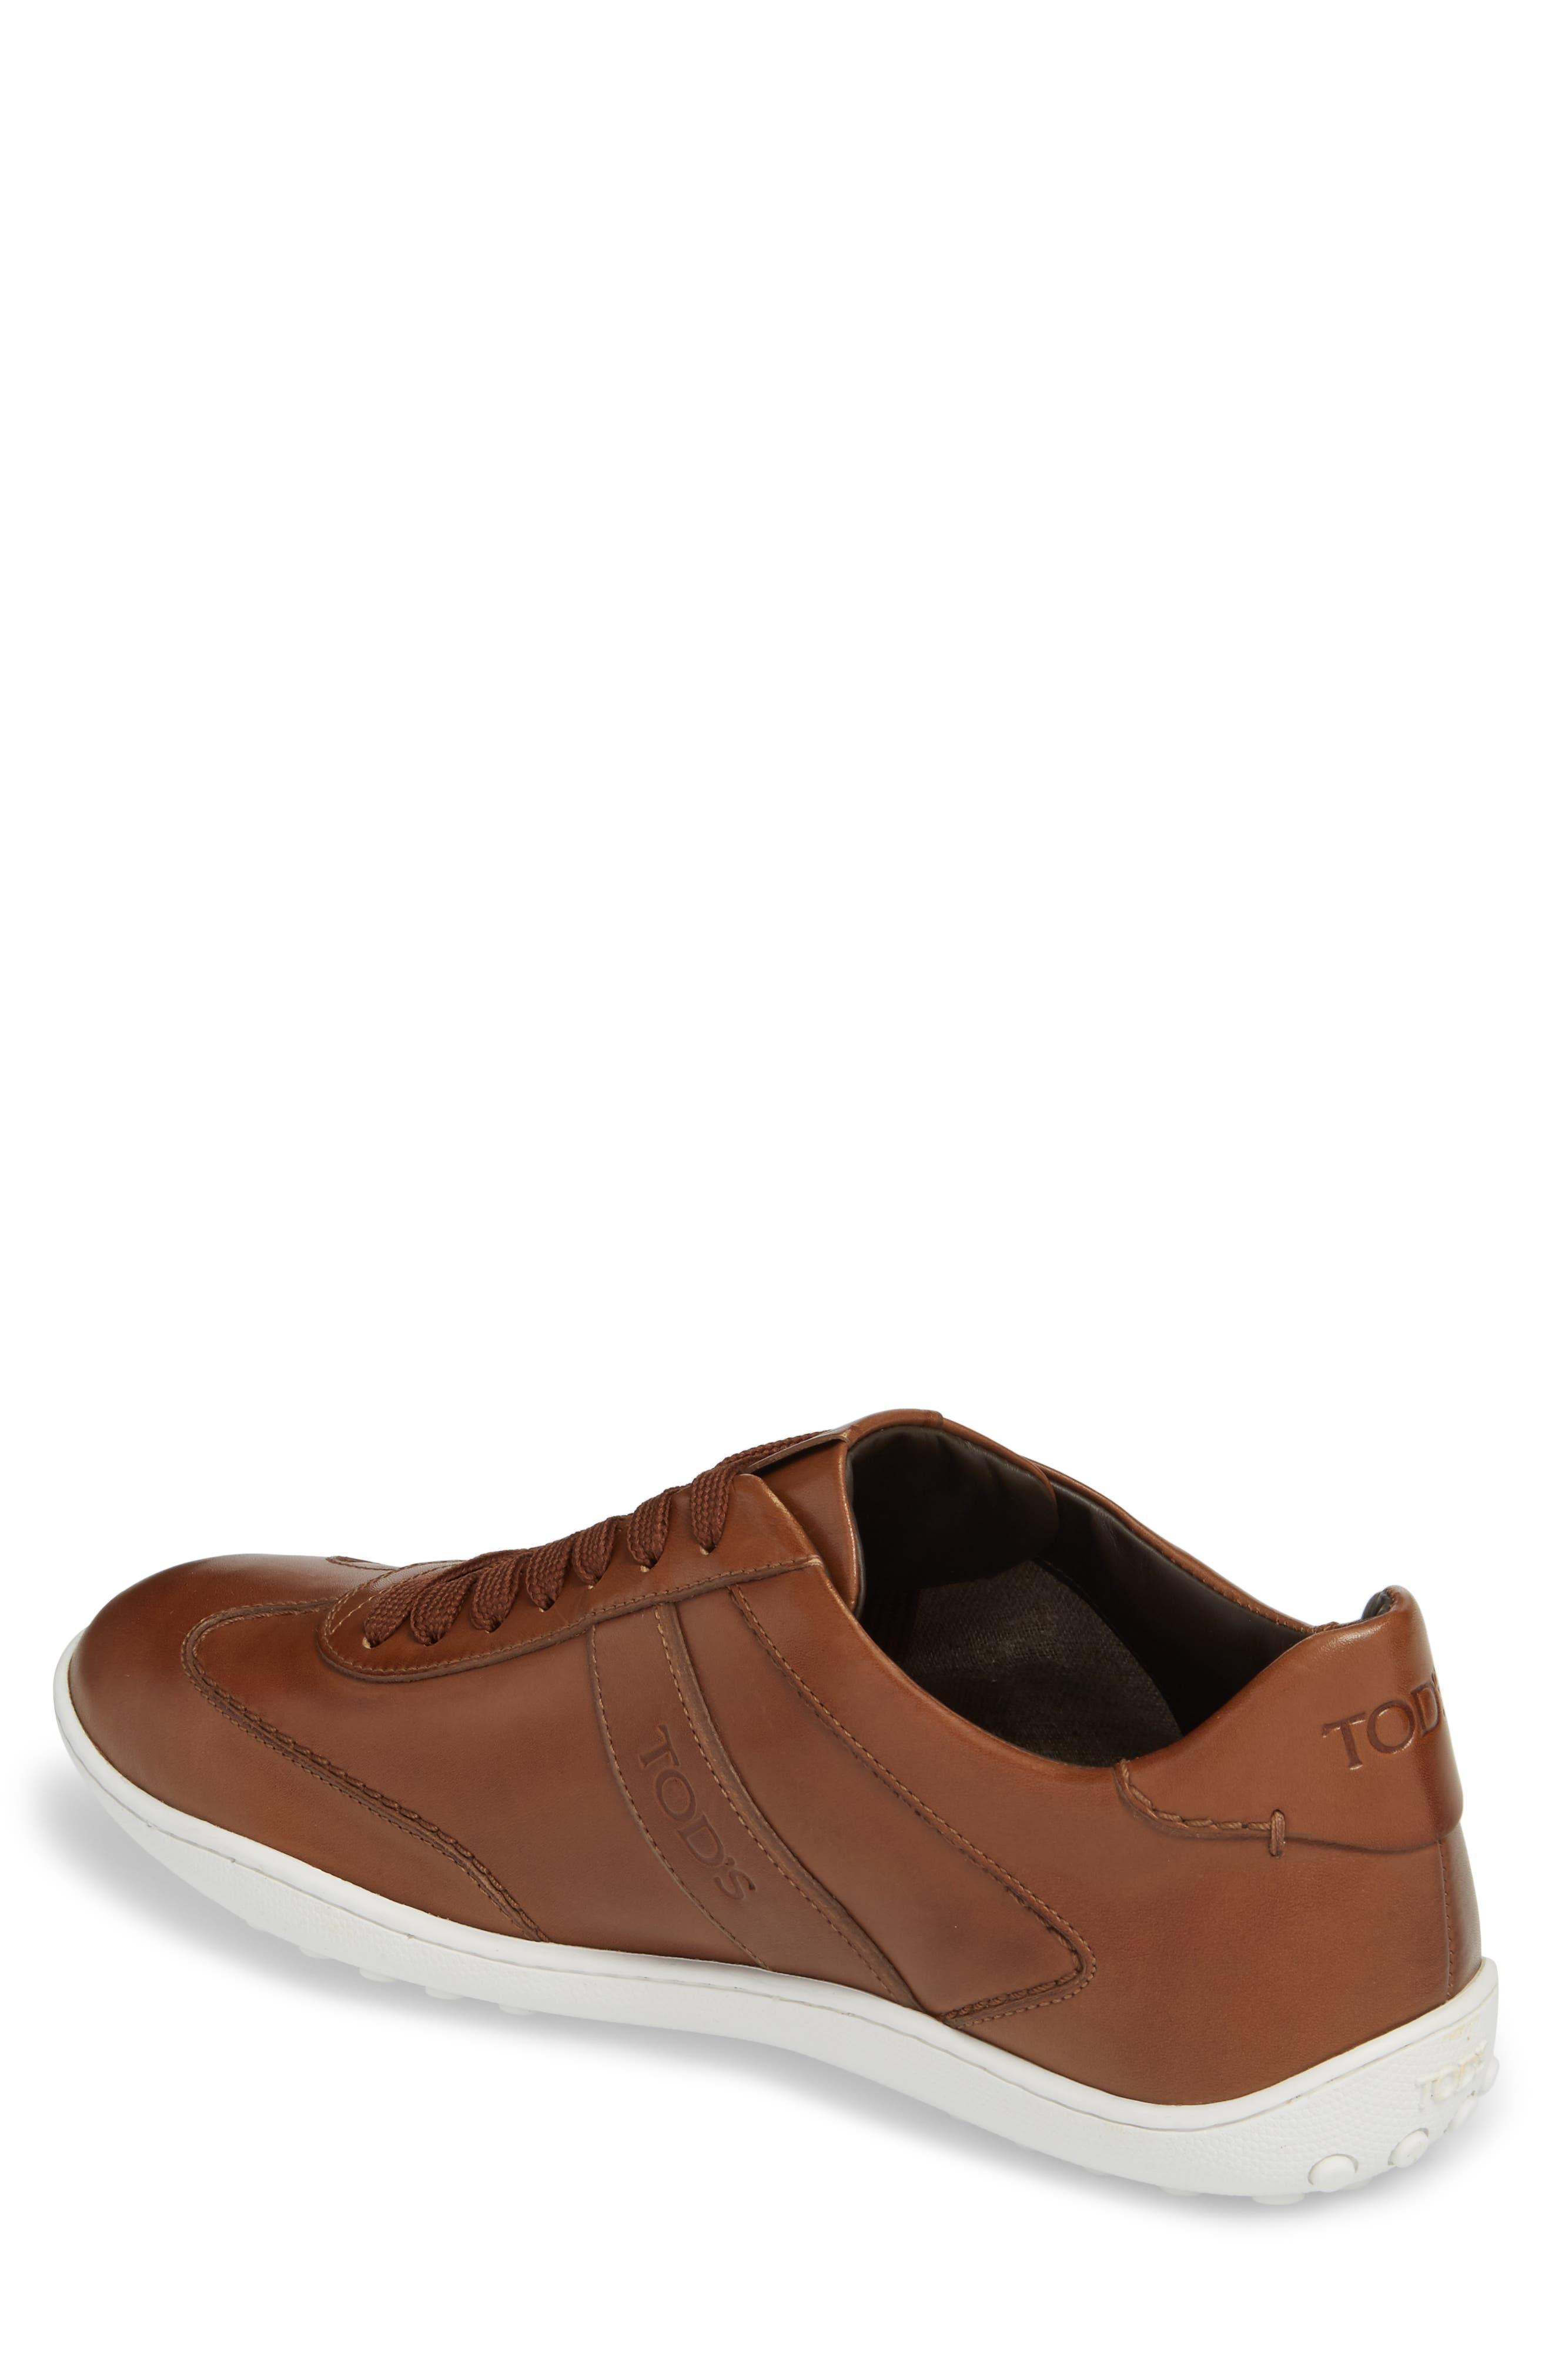 Owen Sneaker,                             Alternate thumbnail 2, color,                             200